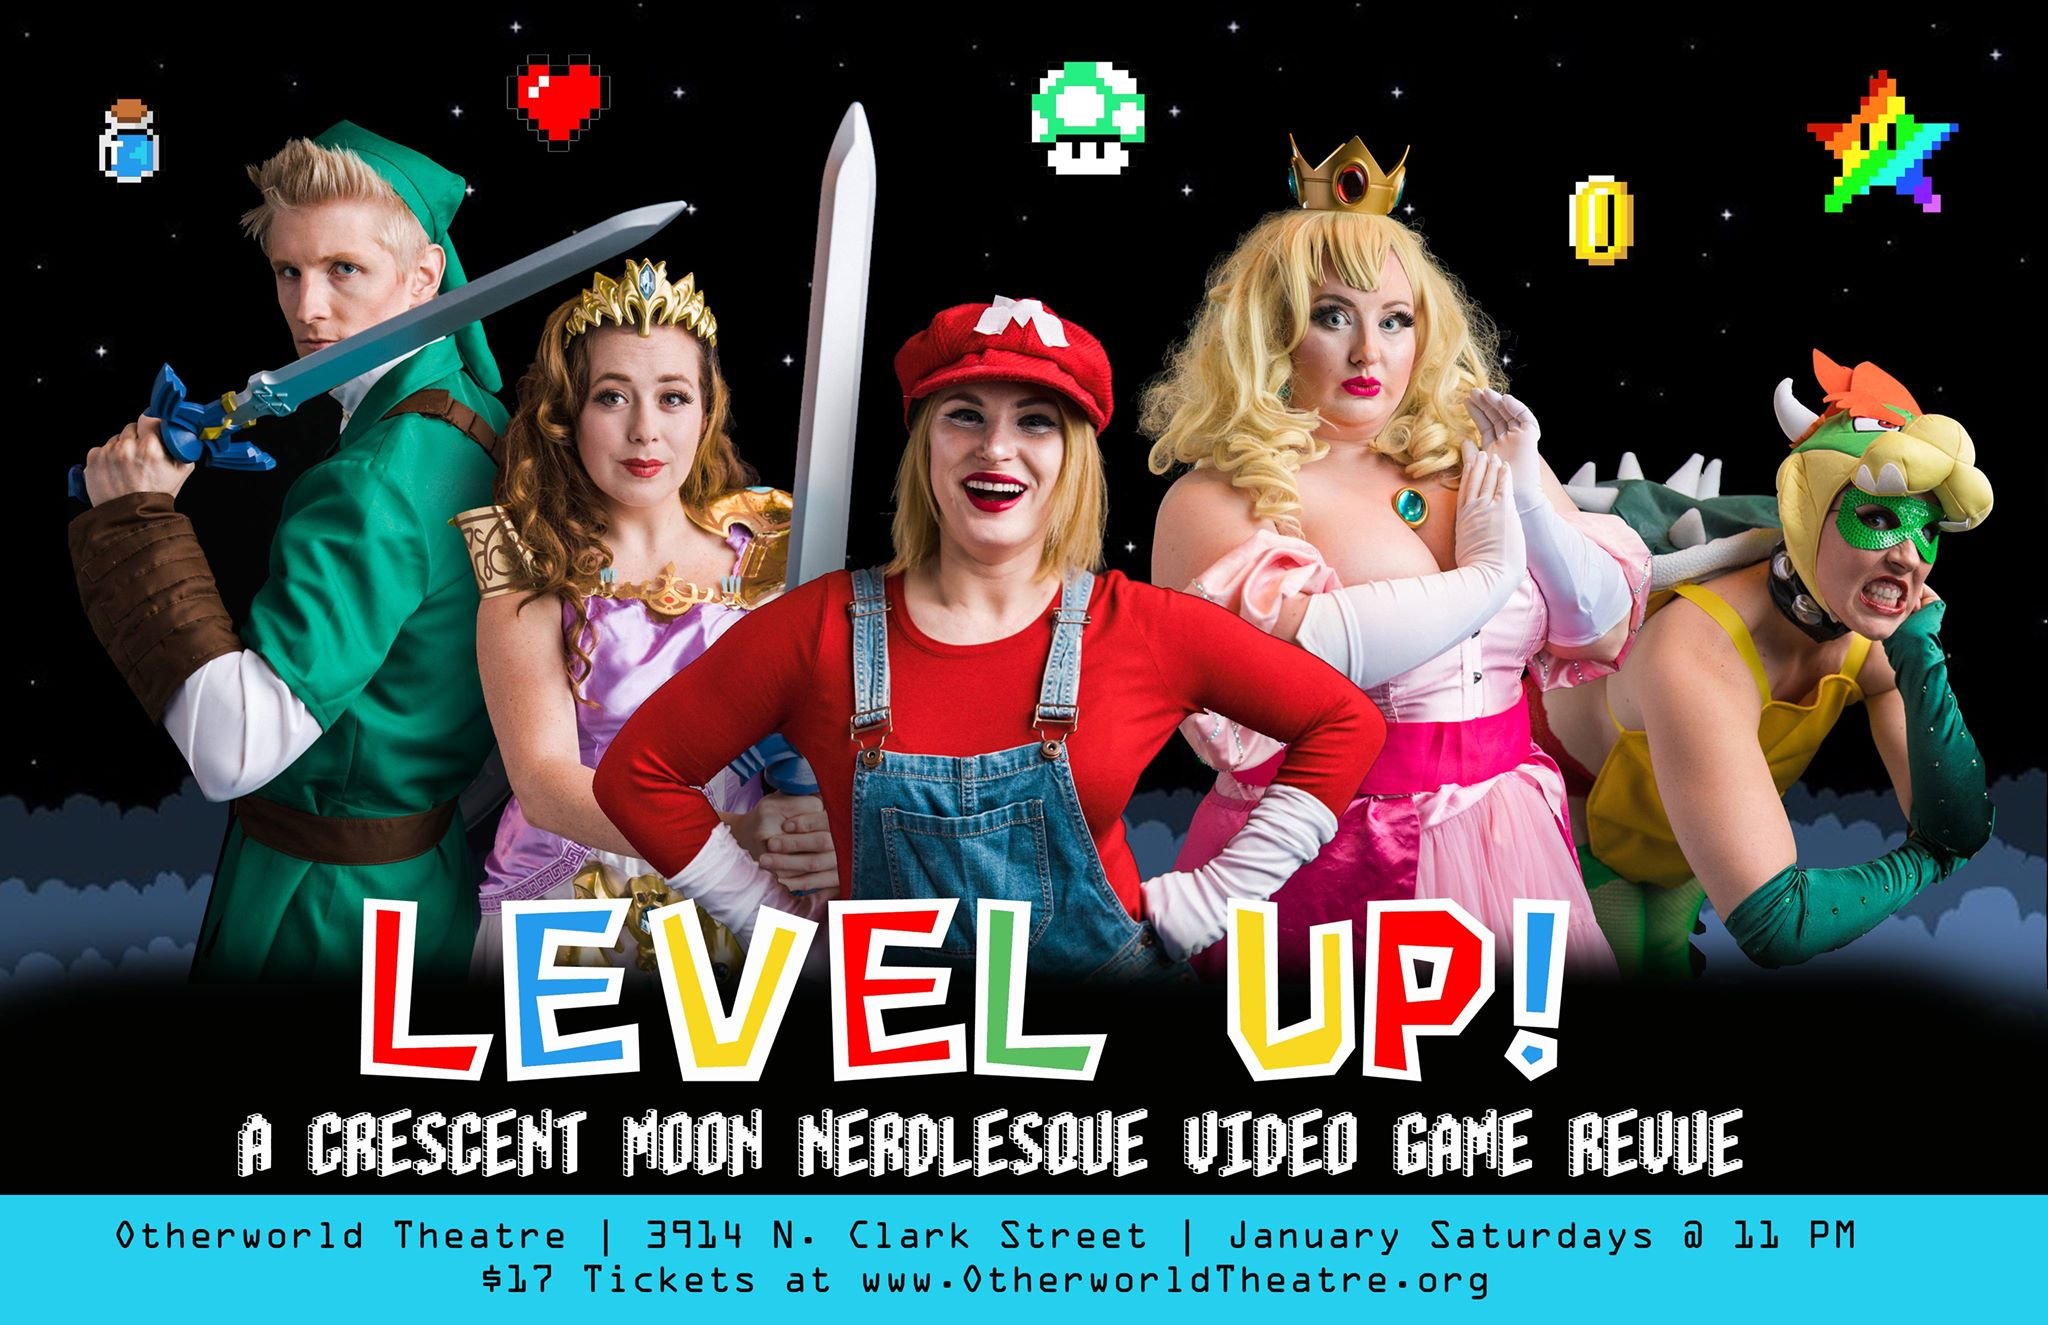 Level Up Original Poster.jpg